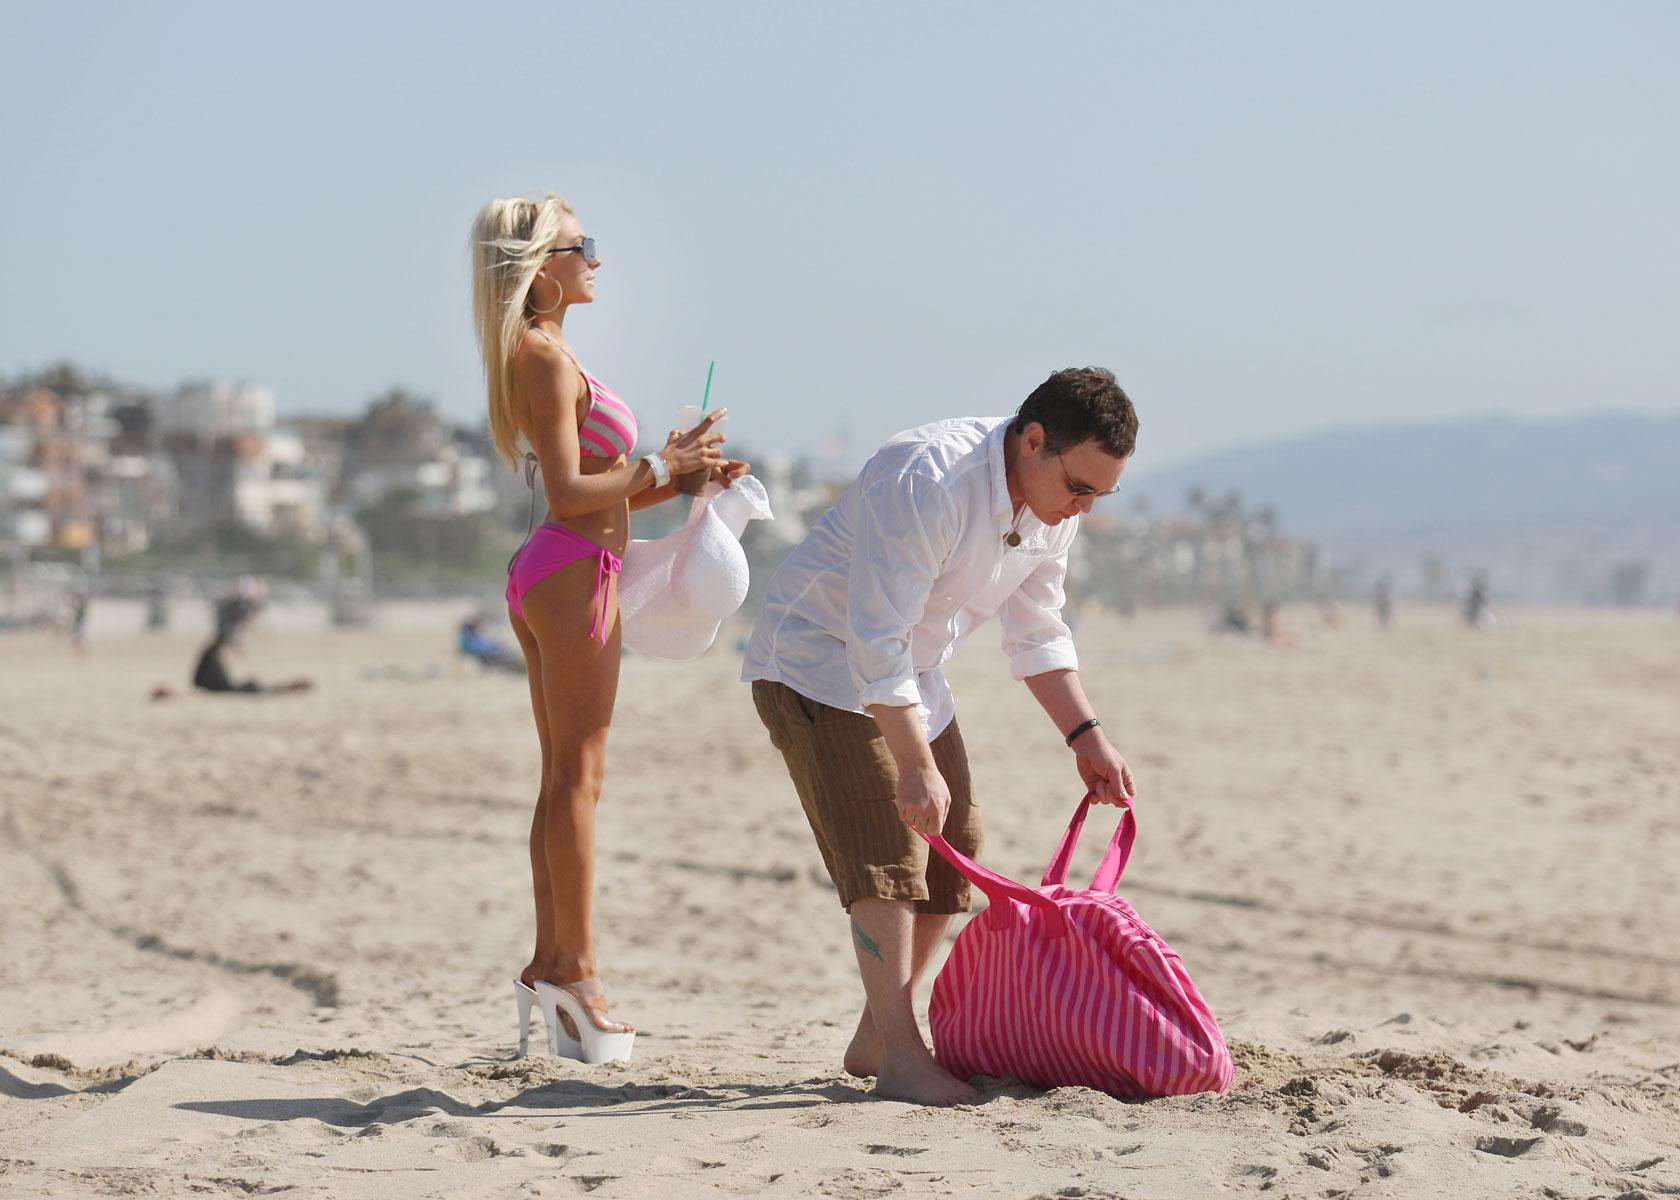 Courtney Stodden in Bikini on the beach in Malibu Pic 30 of 35